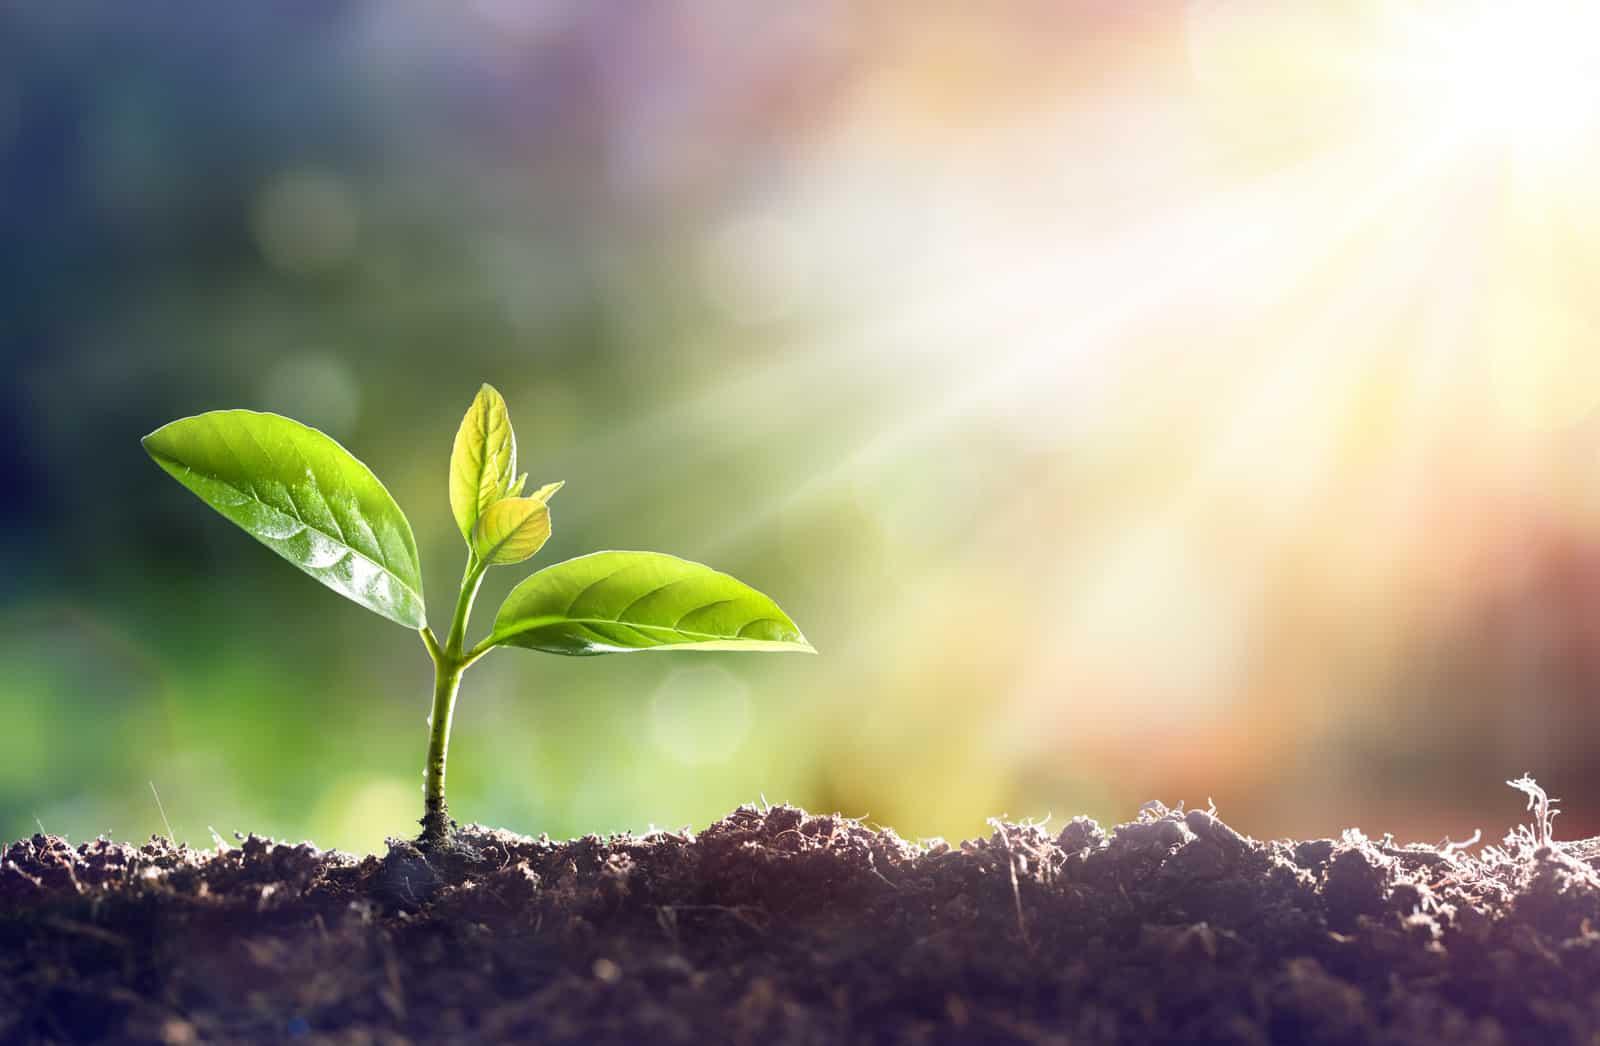 Does marijuana grow better in sunlight or artificial light? Marijuana plant growing